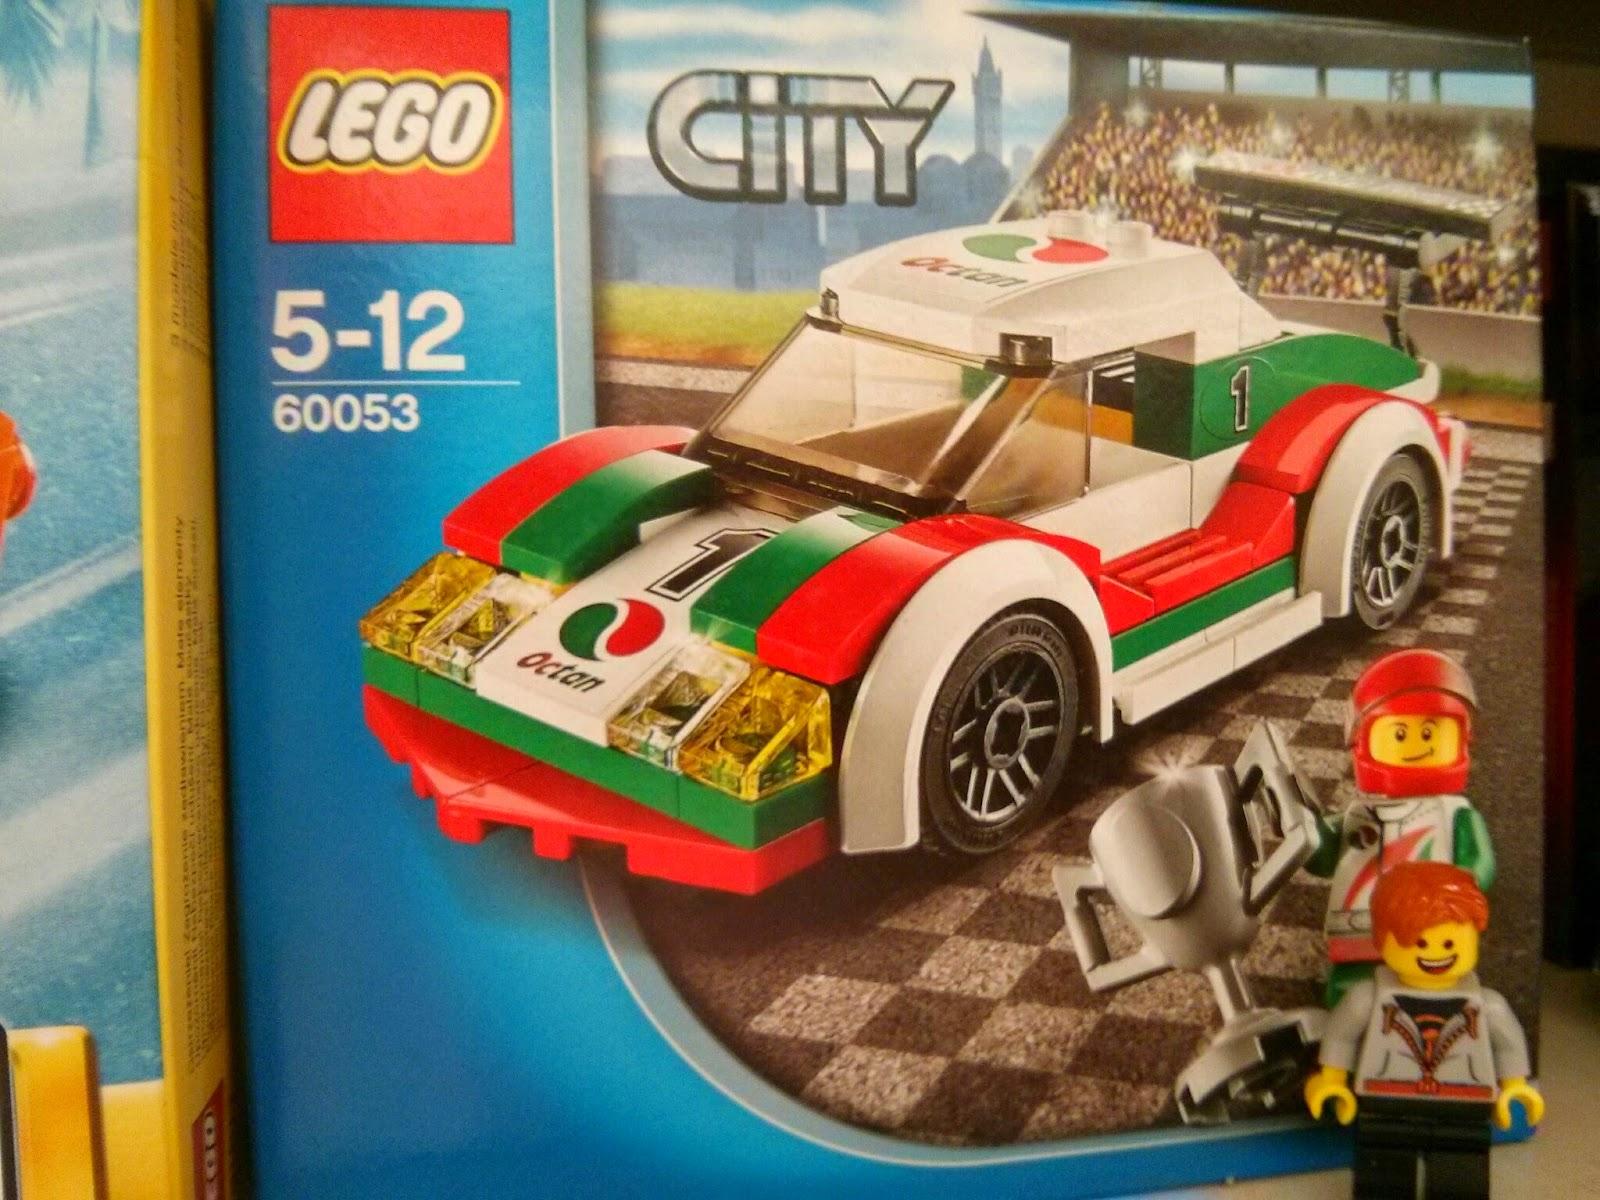 Kyle Emmett and a LEGO City Car